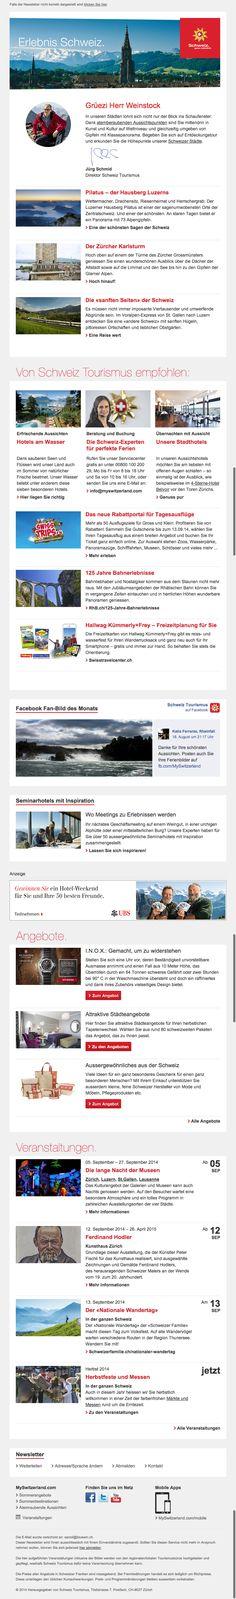 Schweiz Tourimus - mySwitzerland.com